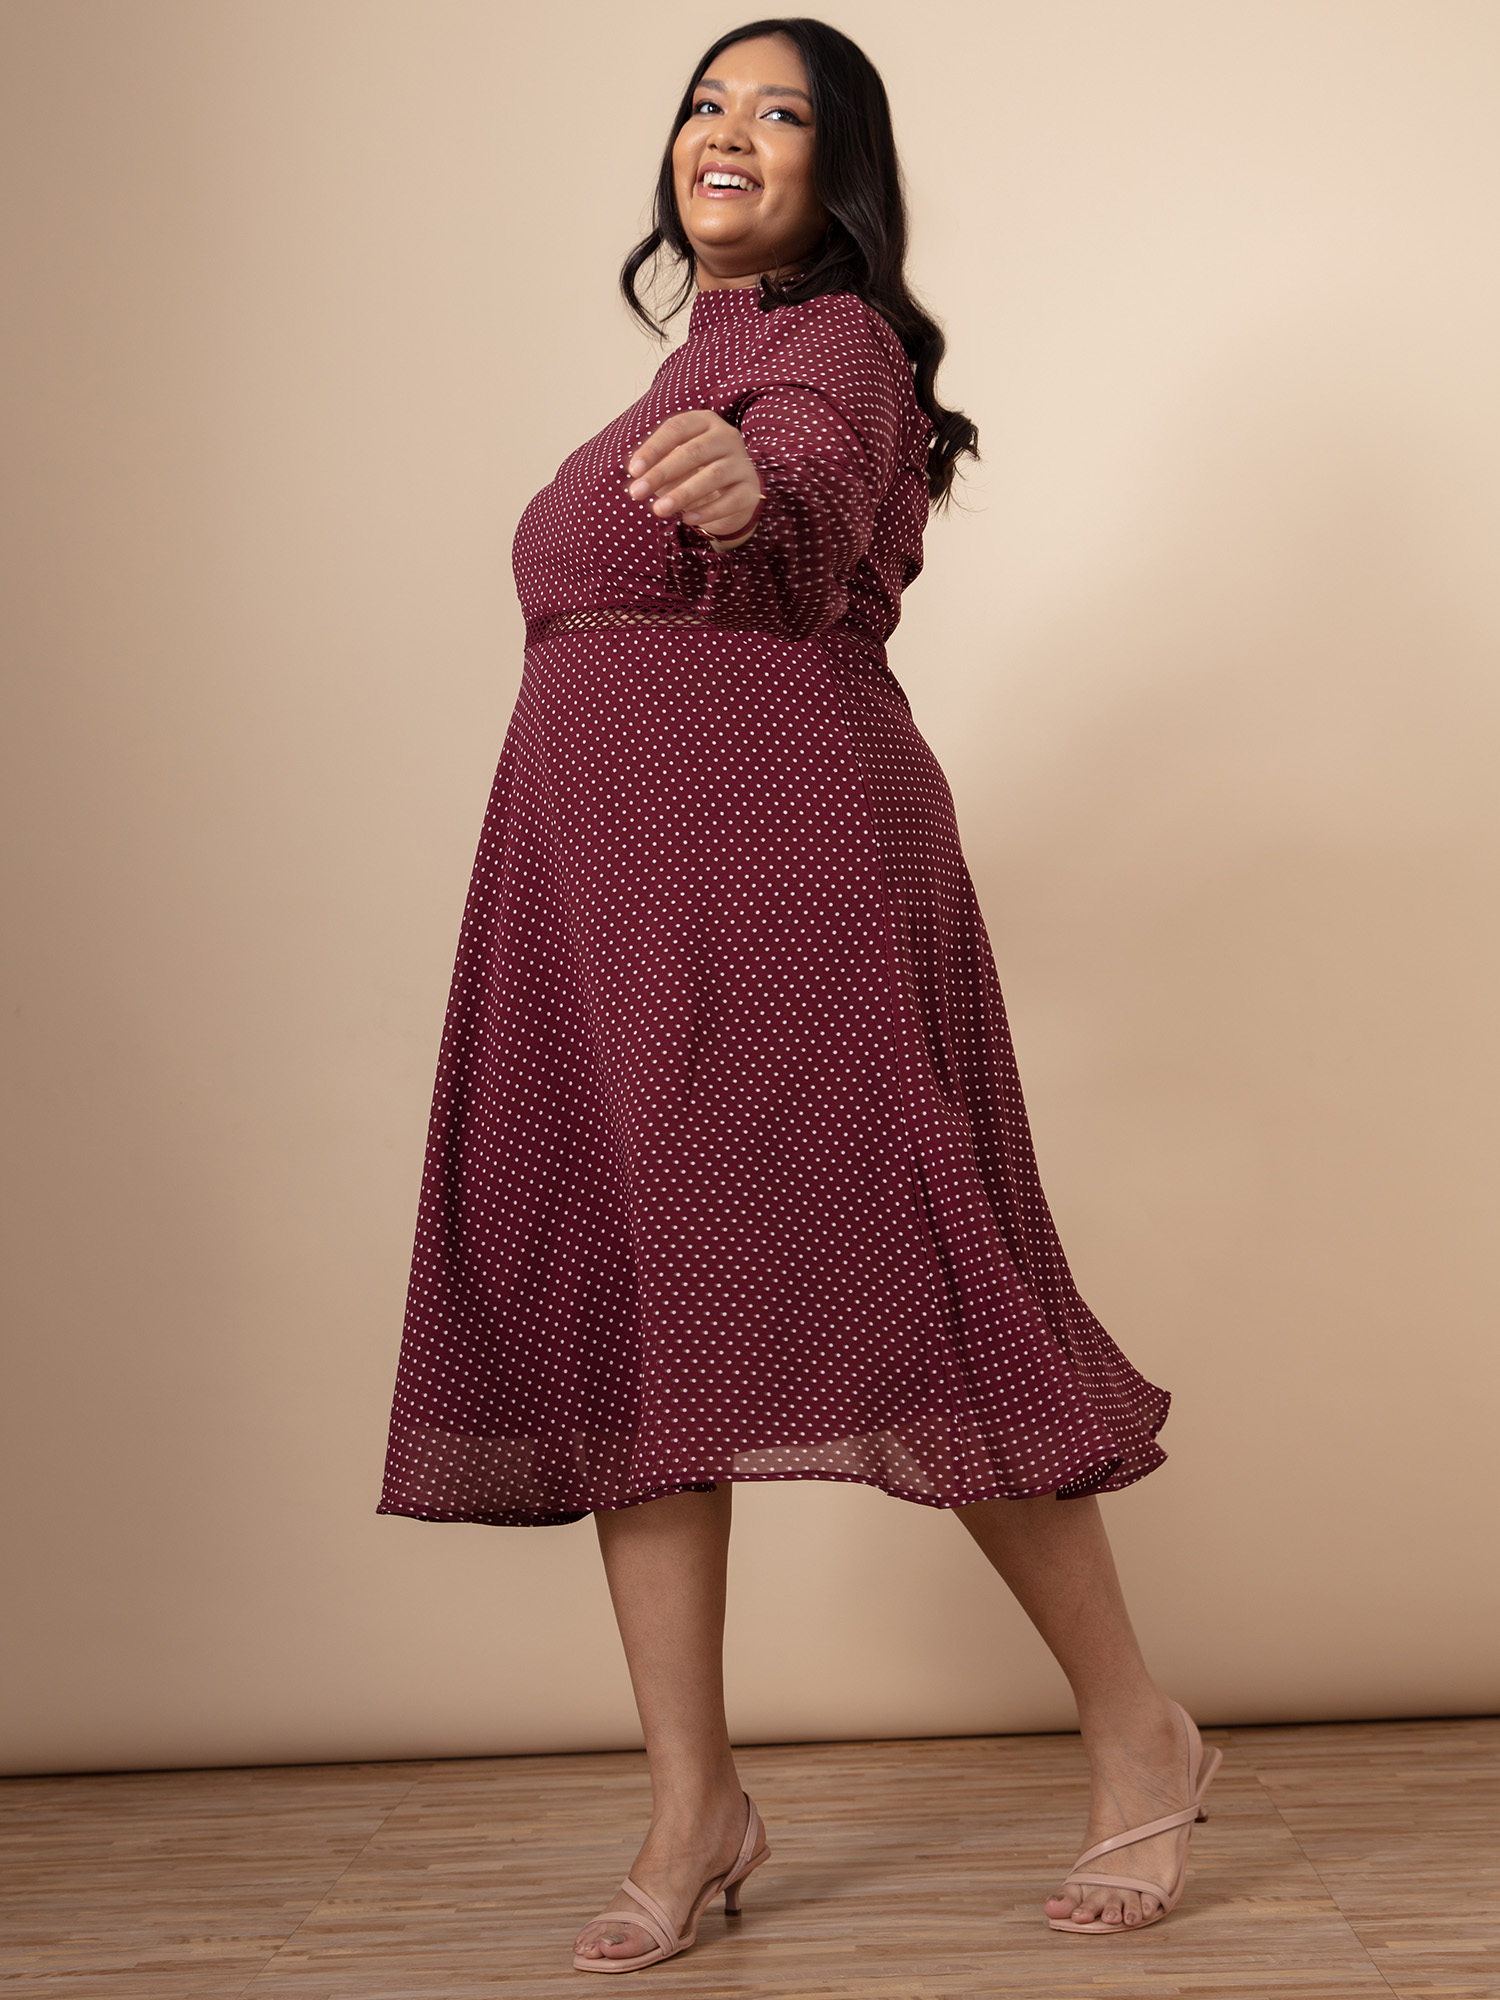 Dresses-Make A Point Polka Dress4